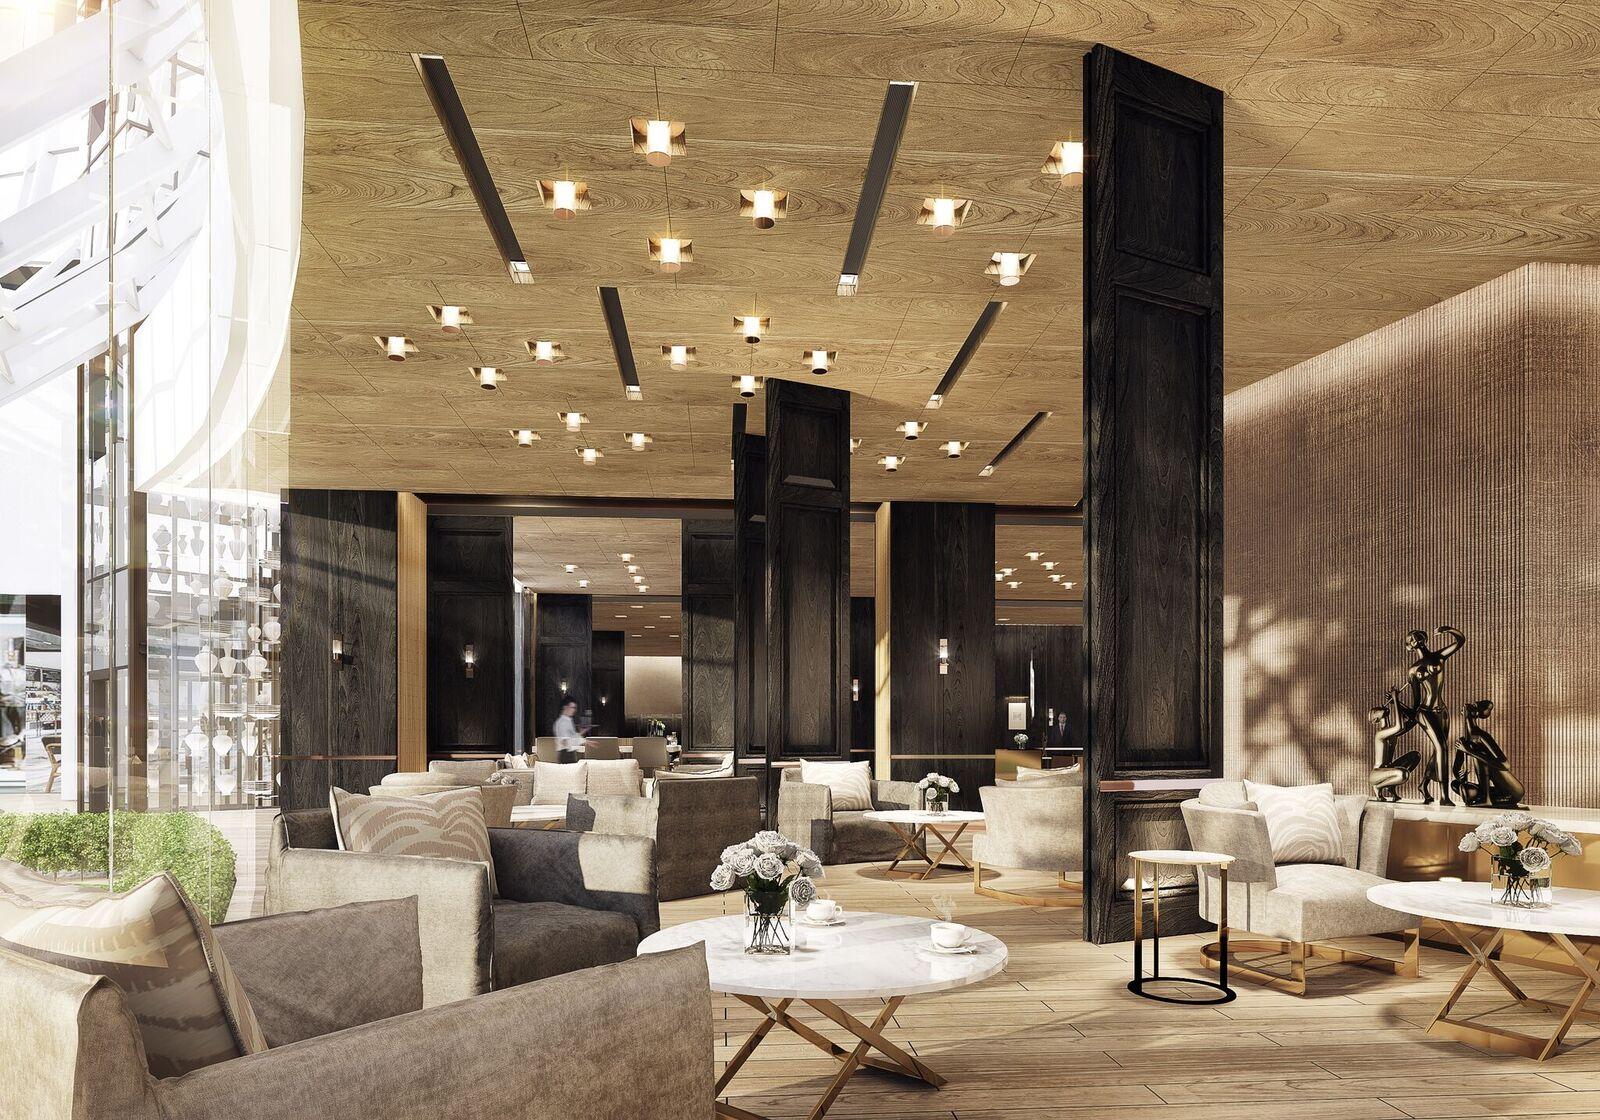 This week's best stories: Hedi Slimane, Hyatt Regency hotels, World Cup stars' private jets and more